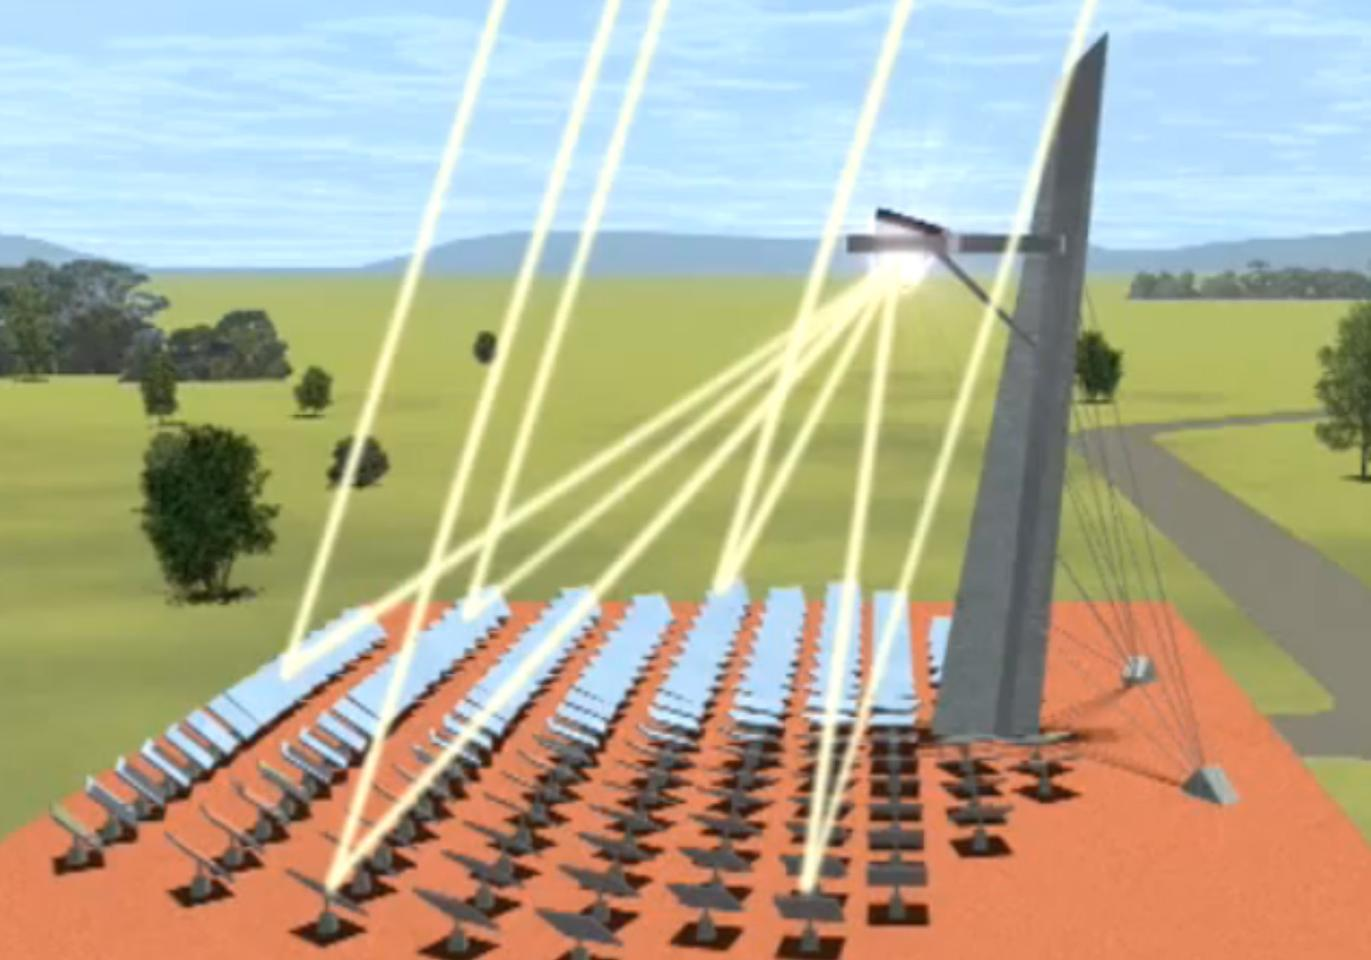 The solar thermal field (Image: CSIRO)